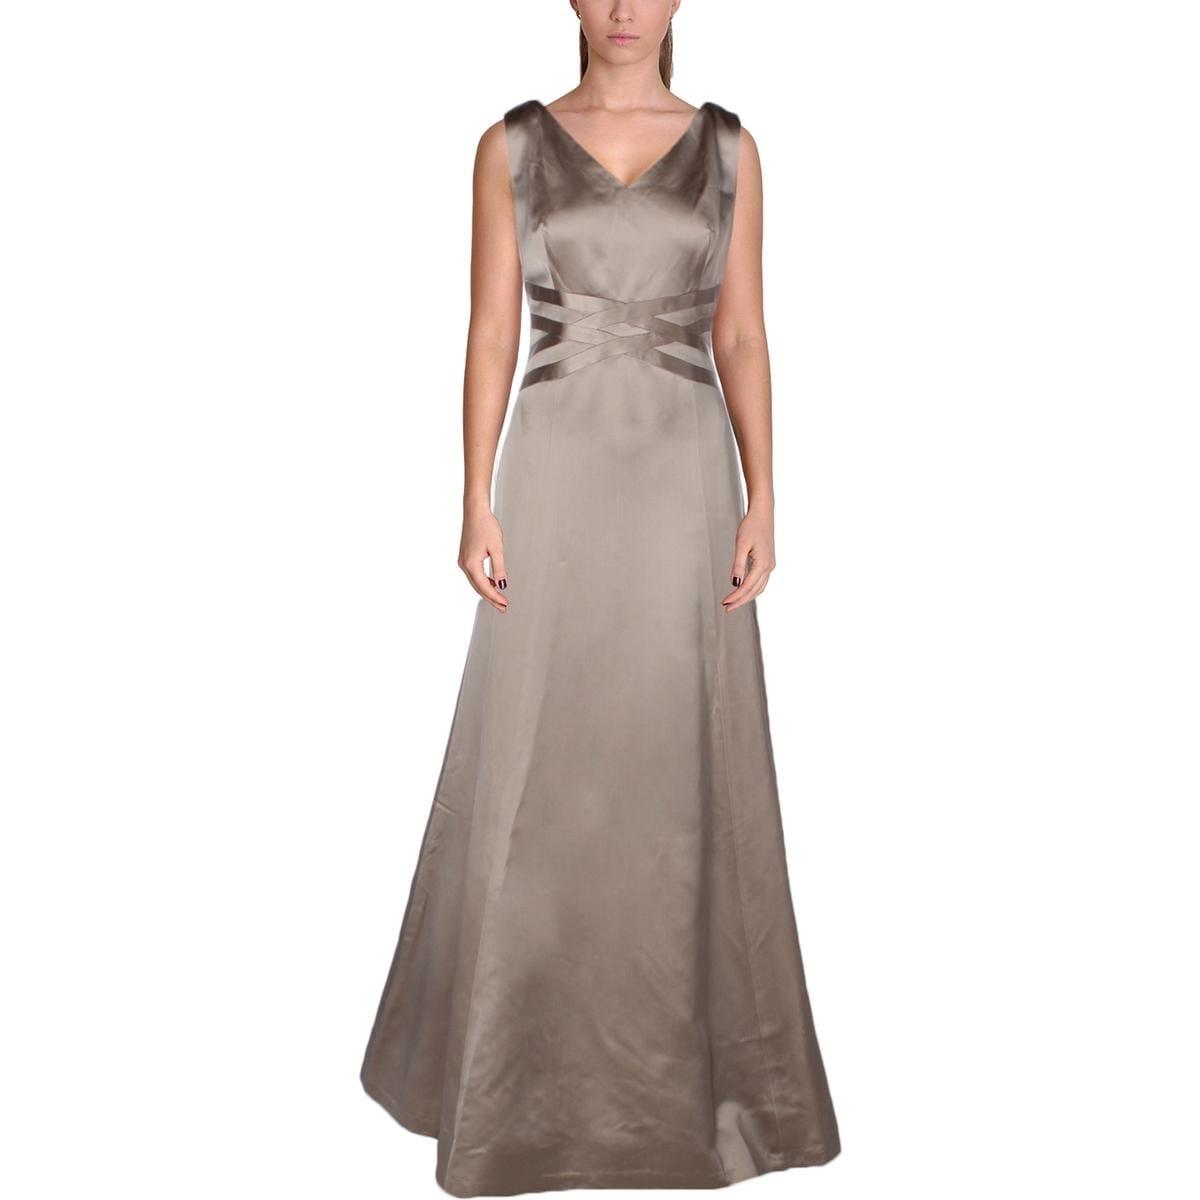 Kay Unger Womens Evening Dress Sleeveless V Neck - Free Shipping ...